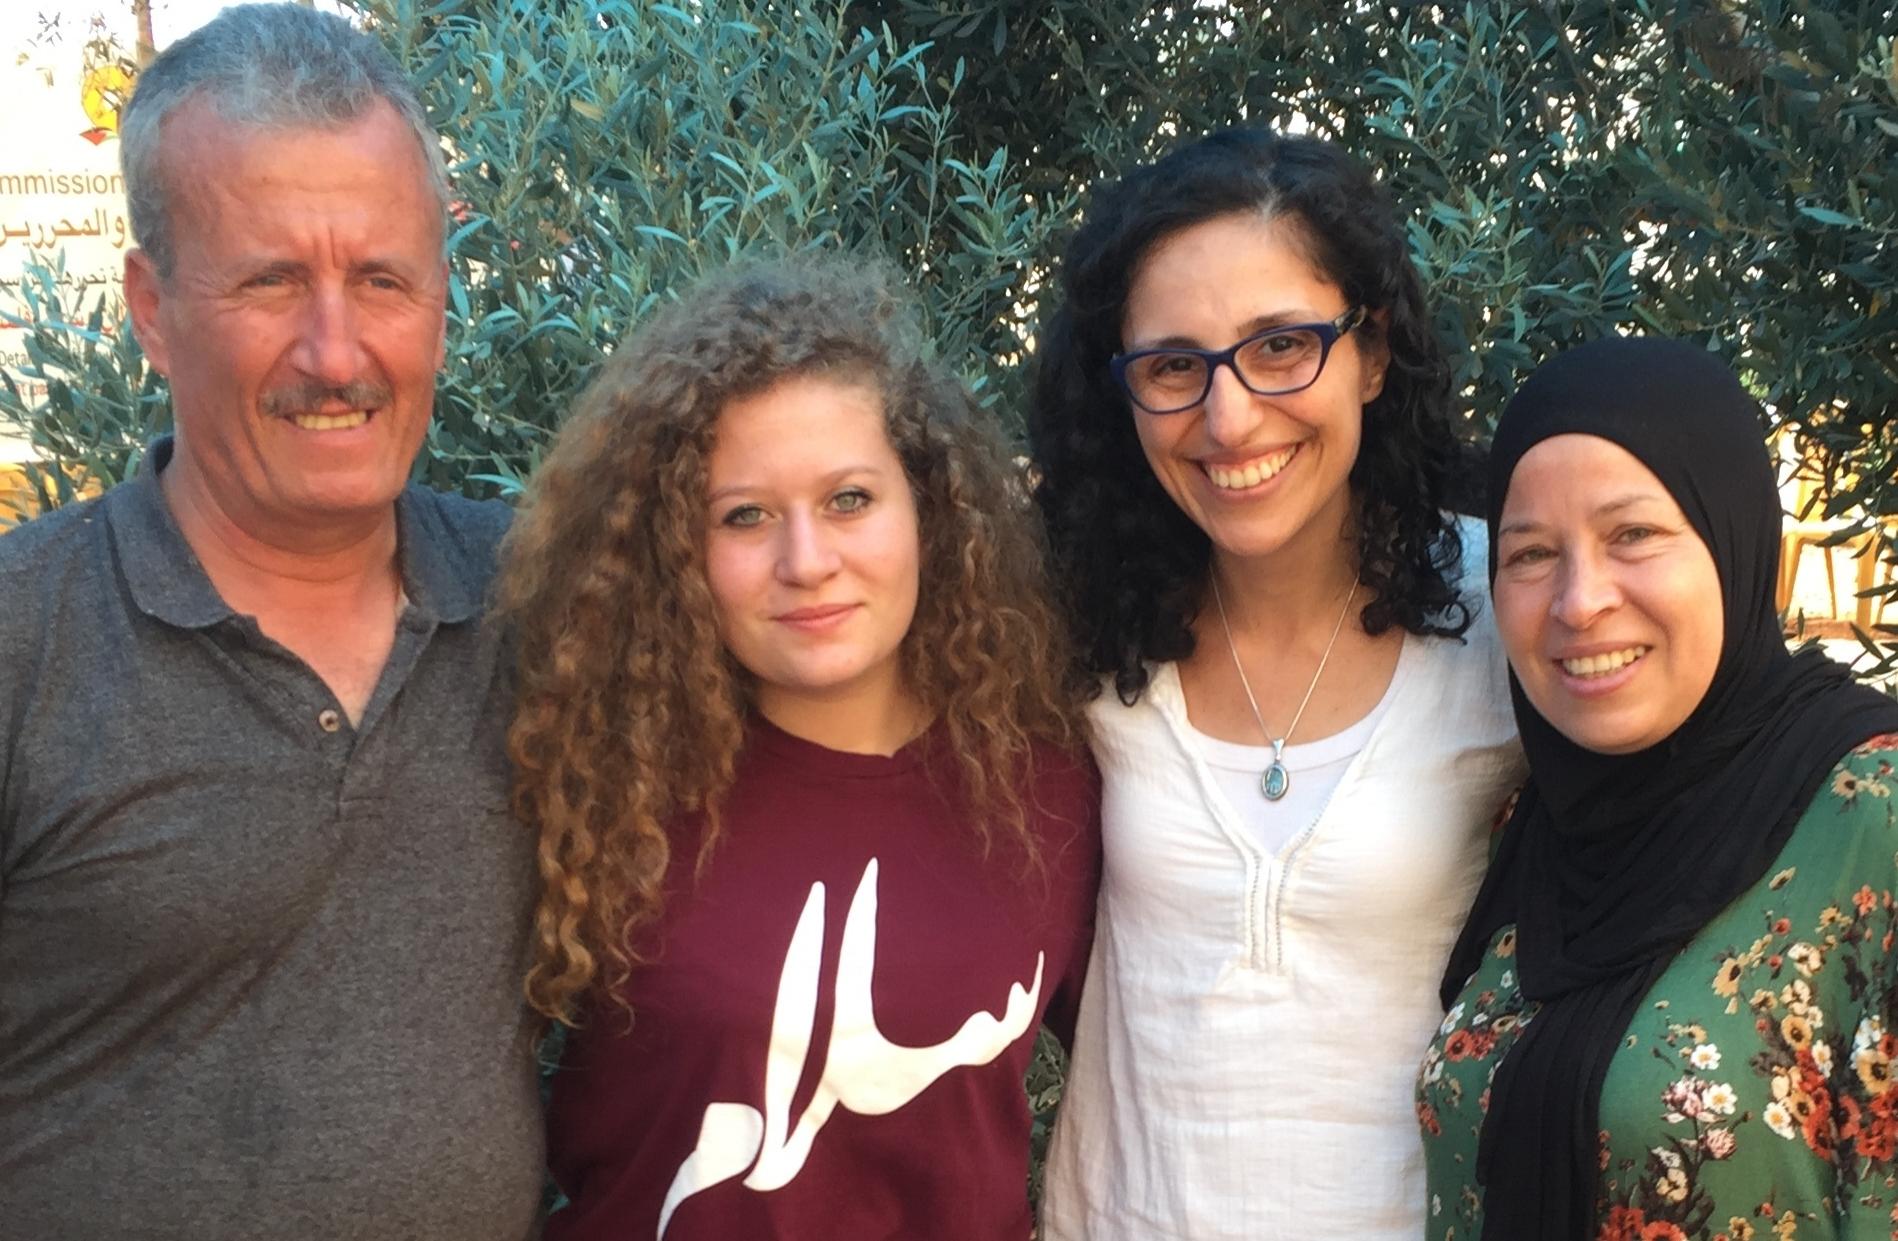 Eyewitness Palestine's Managing Directer, Nada El-Eryan, with Bassem, Ahed, and Nariman Tamimi during a delegation visit to Nabi Saleh.